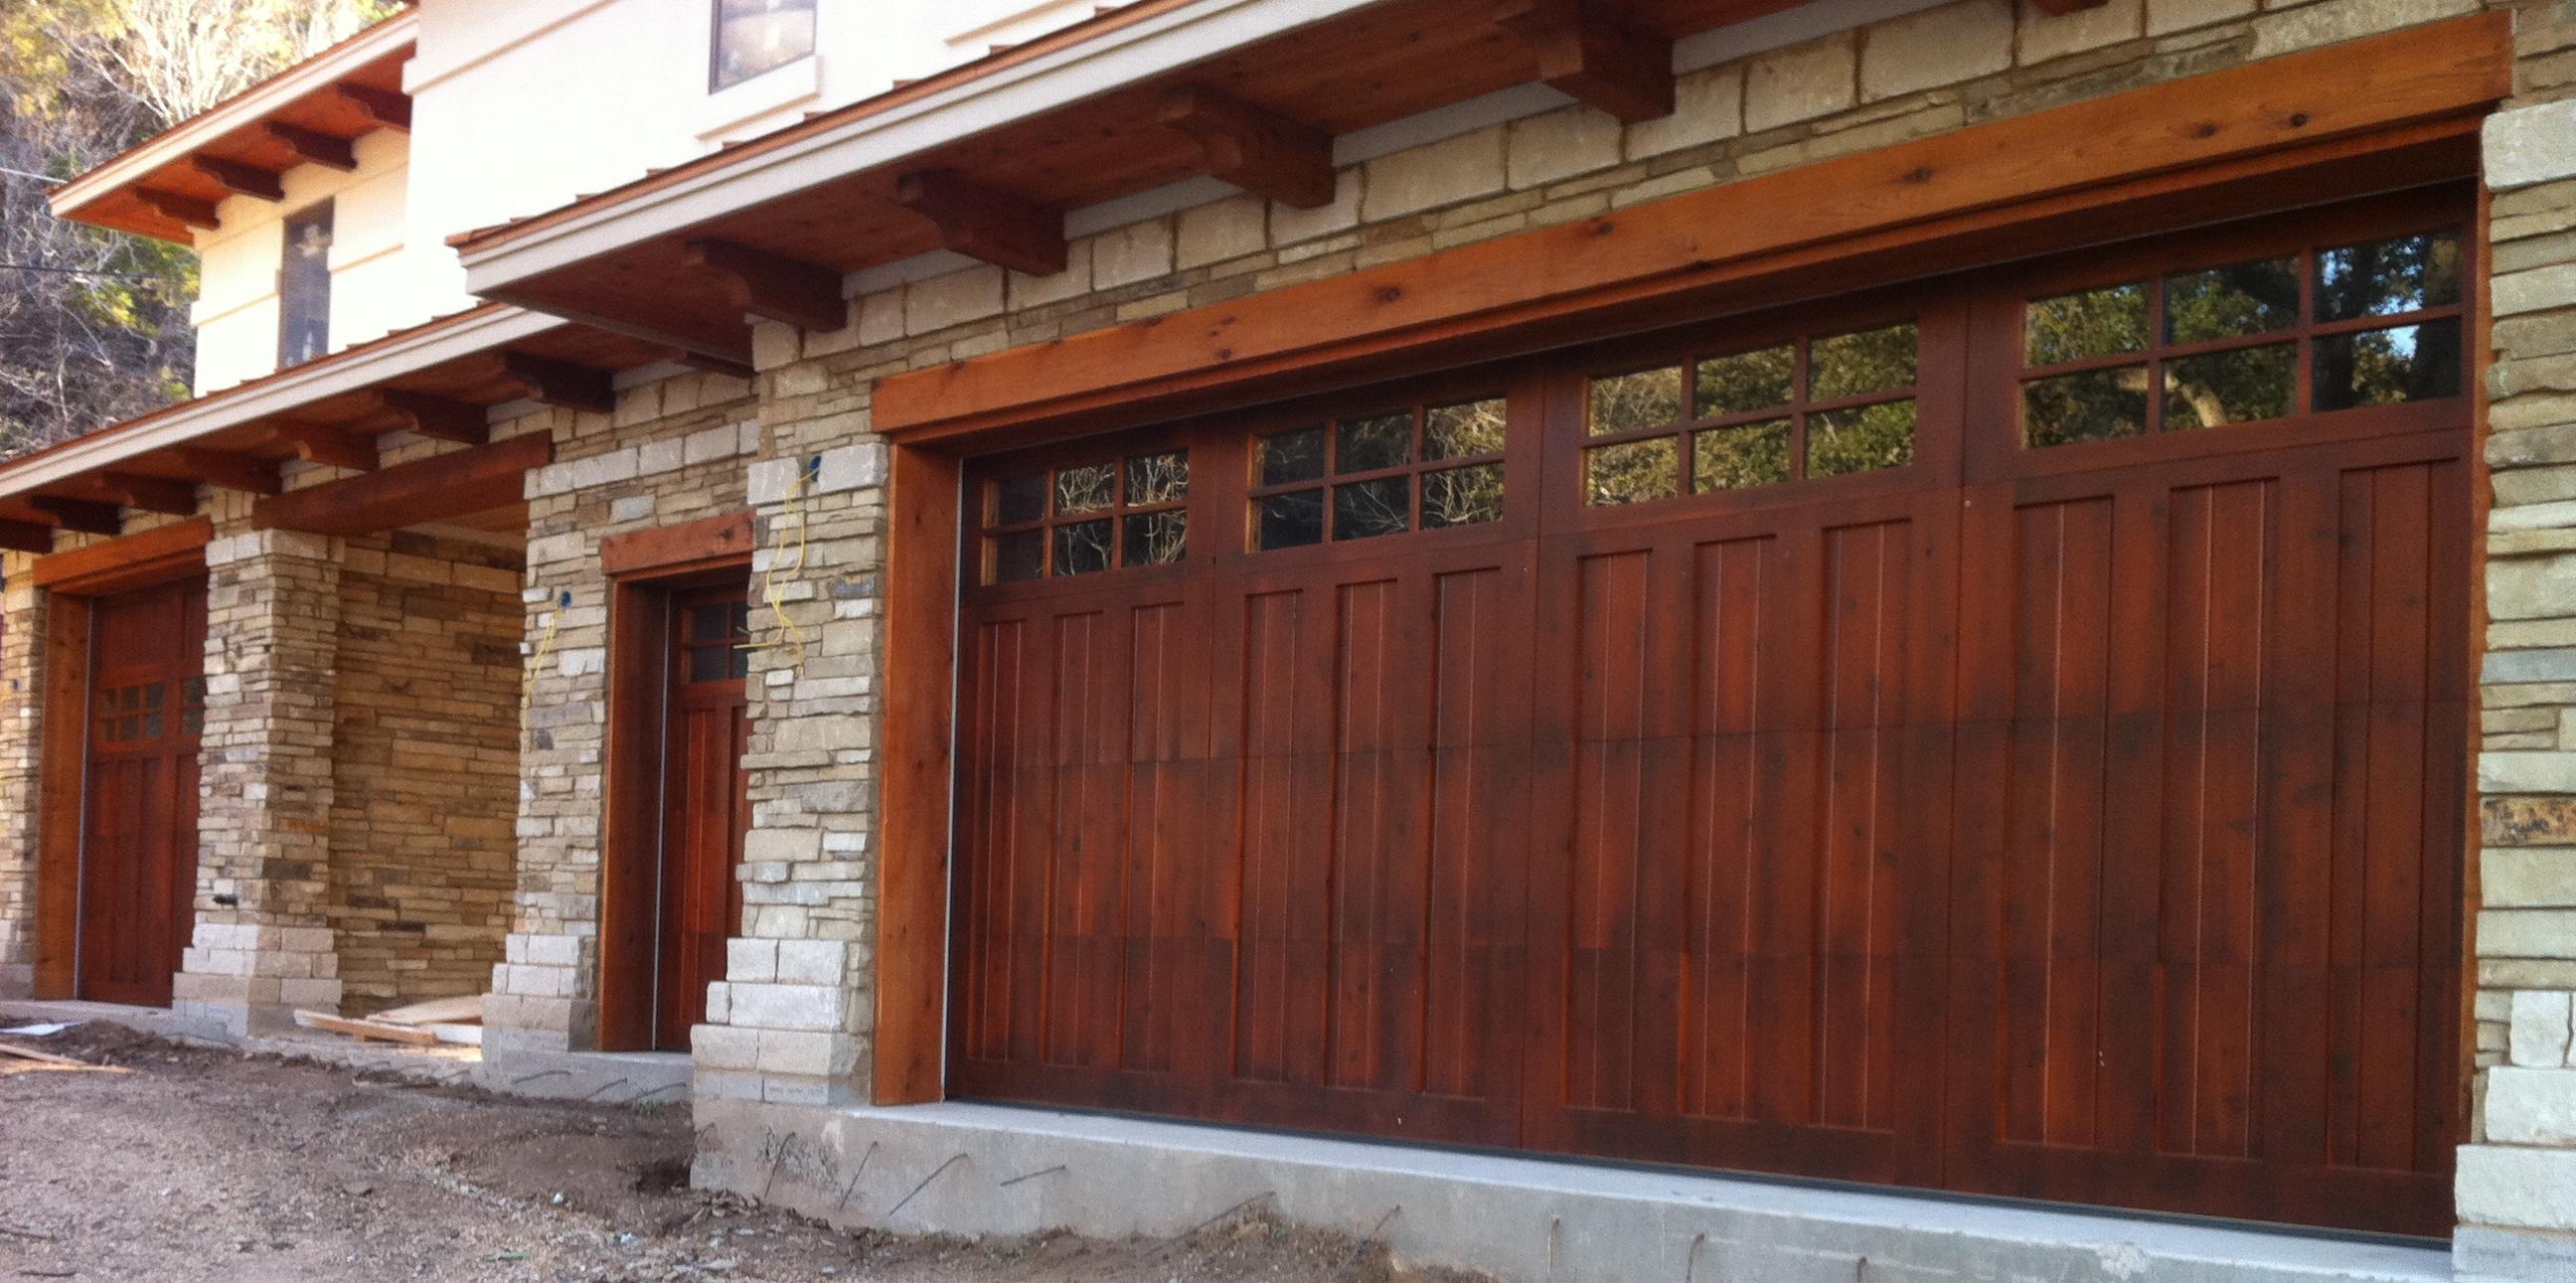 Wood Garage Doors  Repair and Install  Toronto and GTA